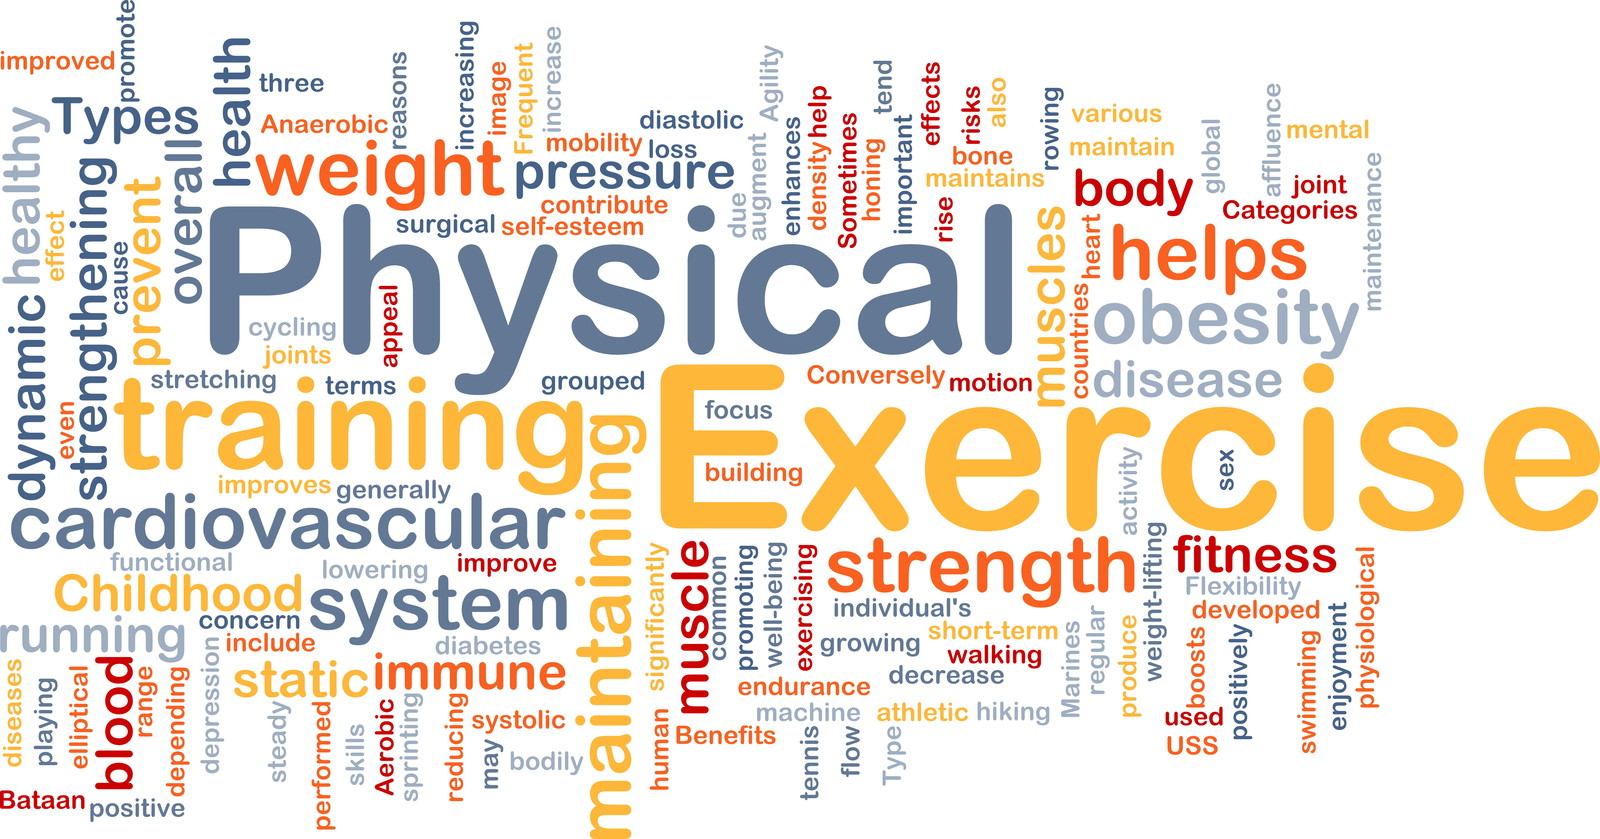 The benefits of fitness izmirmasajfo